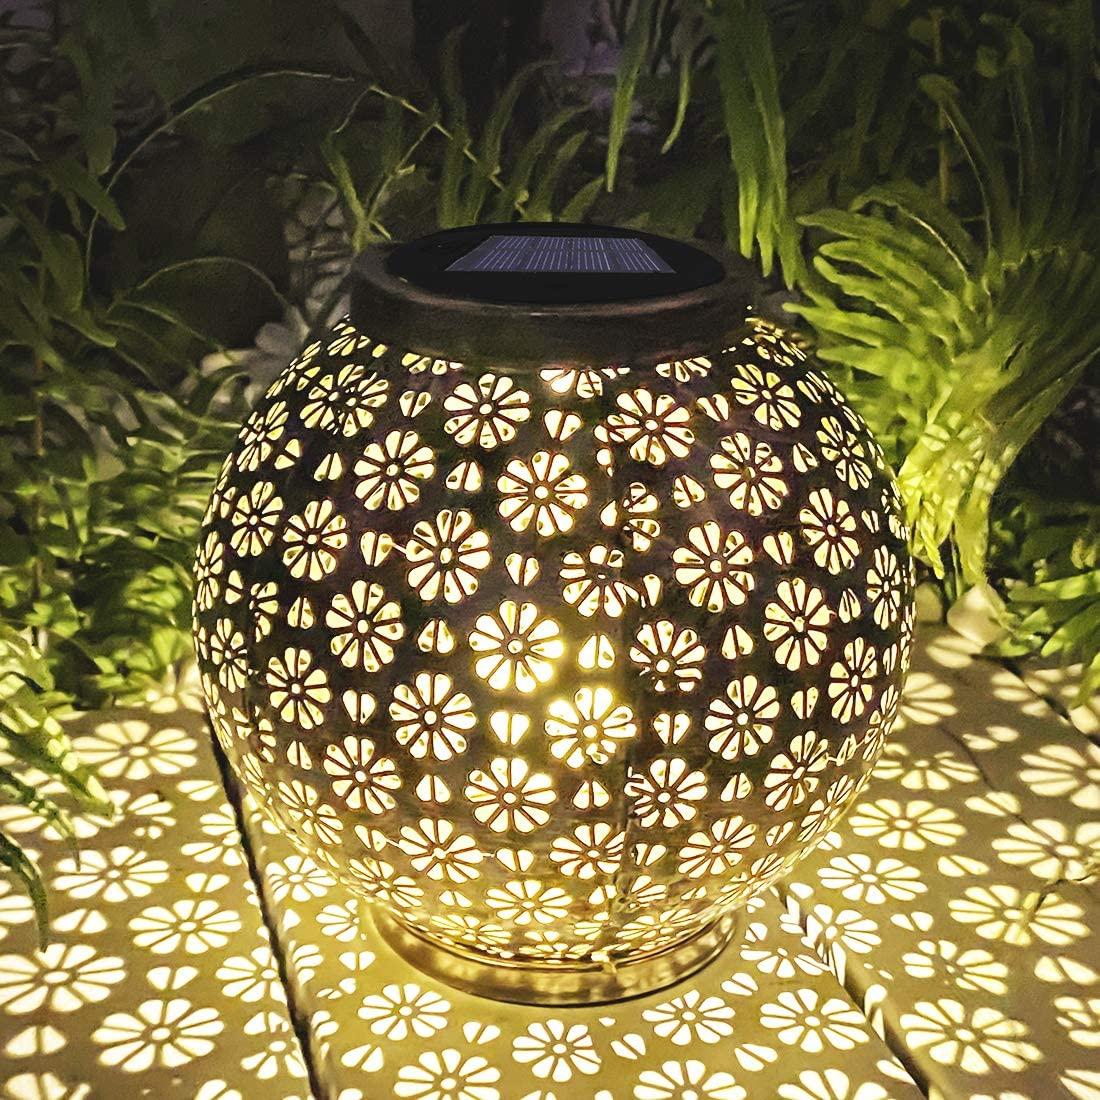 Solar Lantern Outdoor Hanging, Waterproof Metal Hanging Solar Lantern Lights Decorative for Garden, Yard, Tabletop, Patio, Lawn